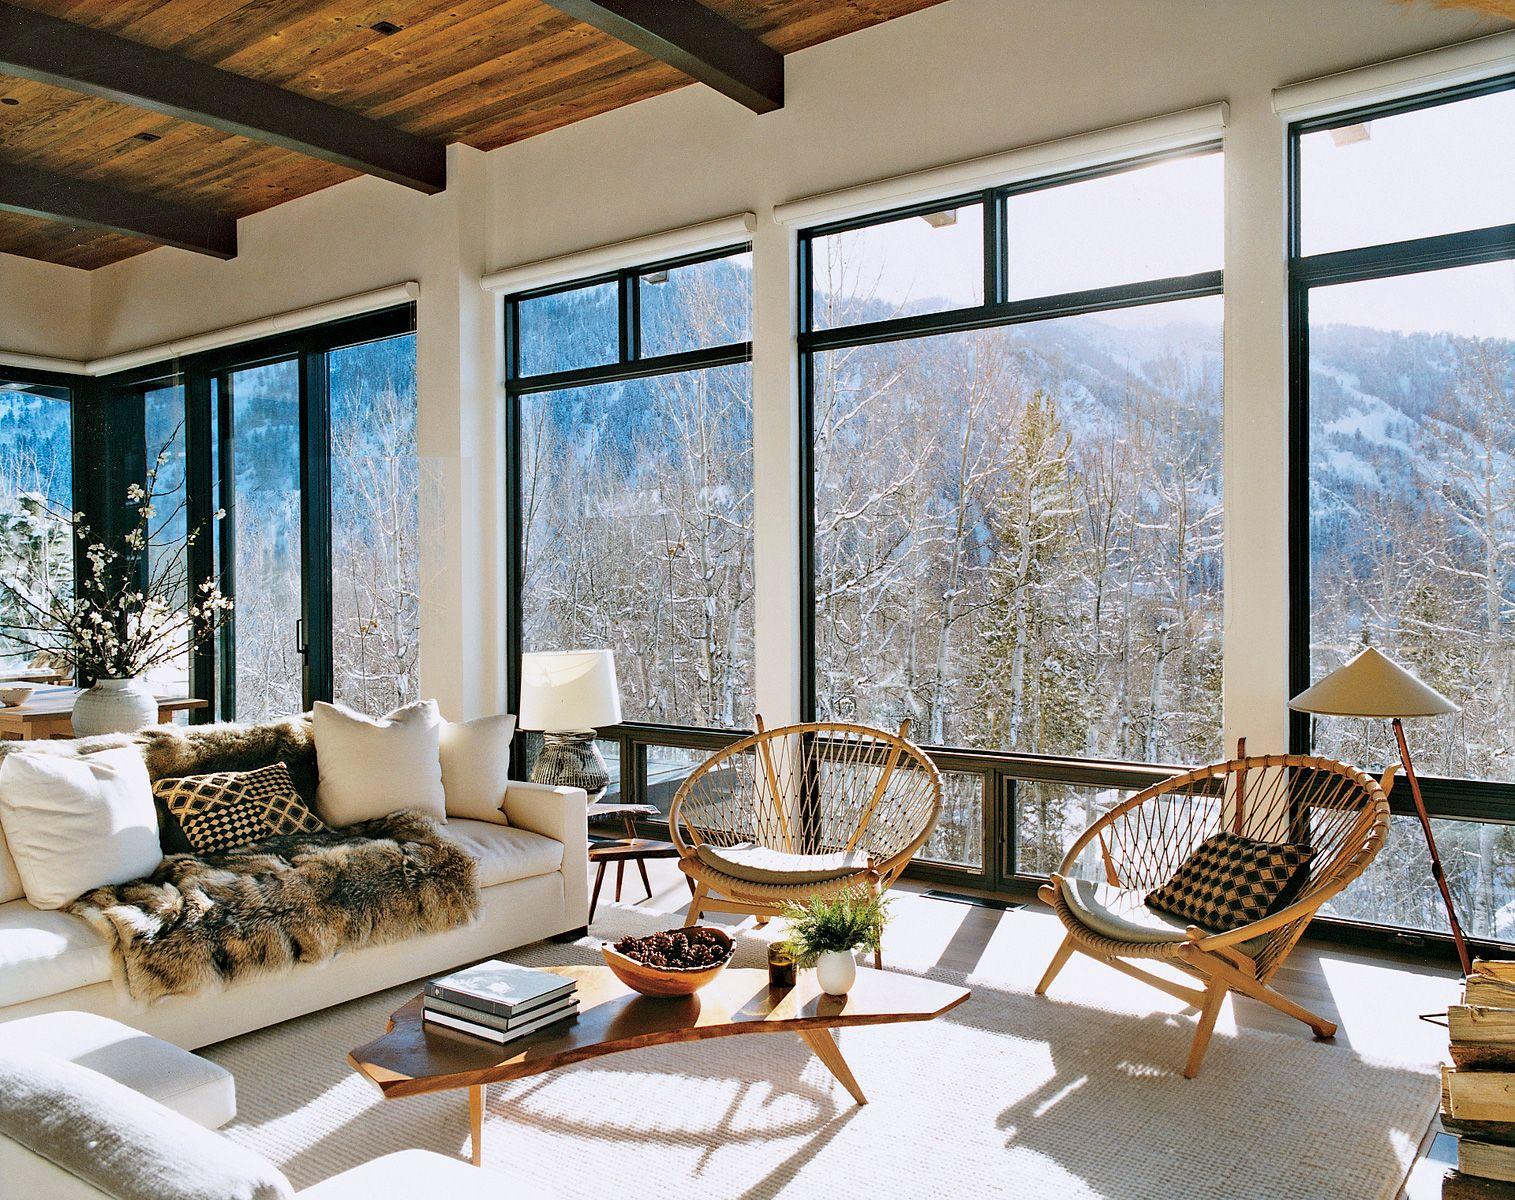 Ski house designs